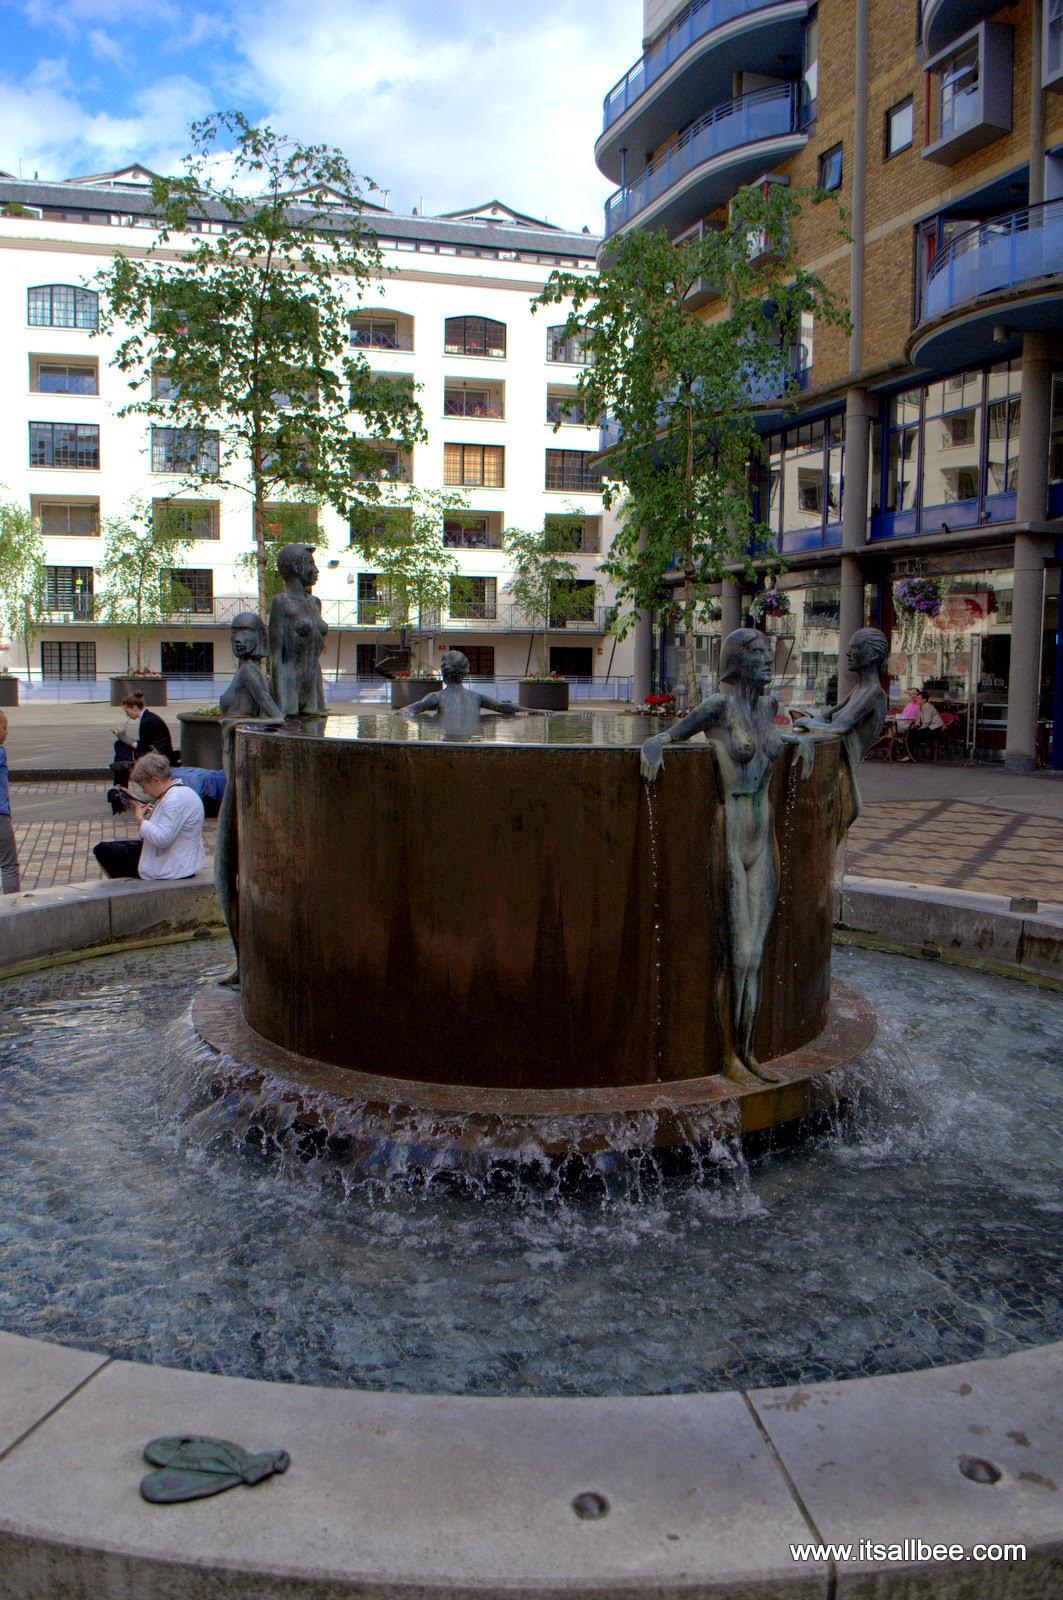 Bathing Beauties on Butler's Wharf - london tower bridge